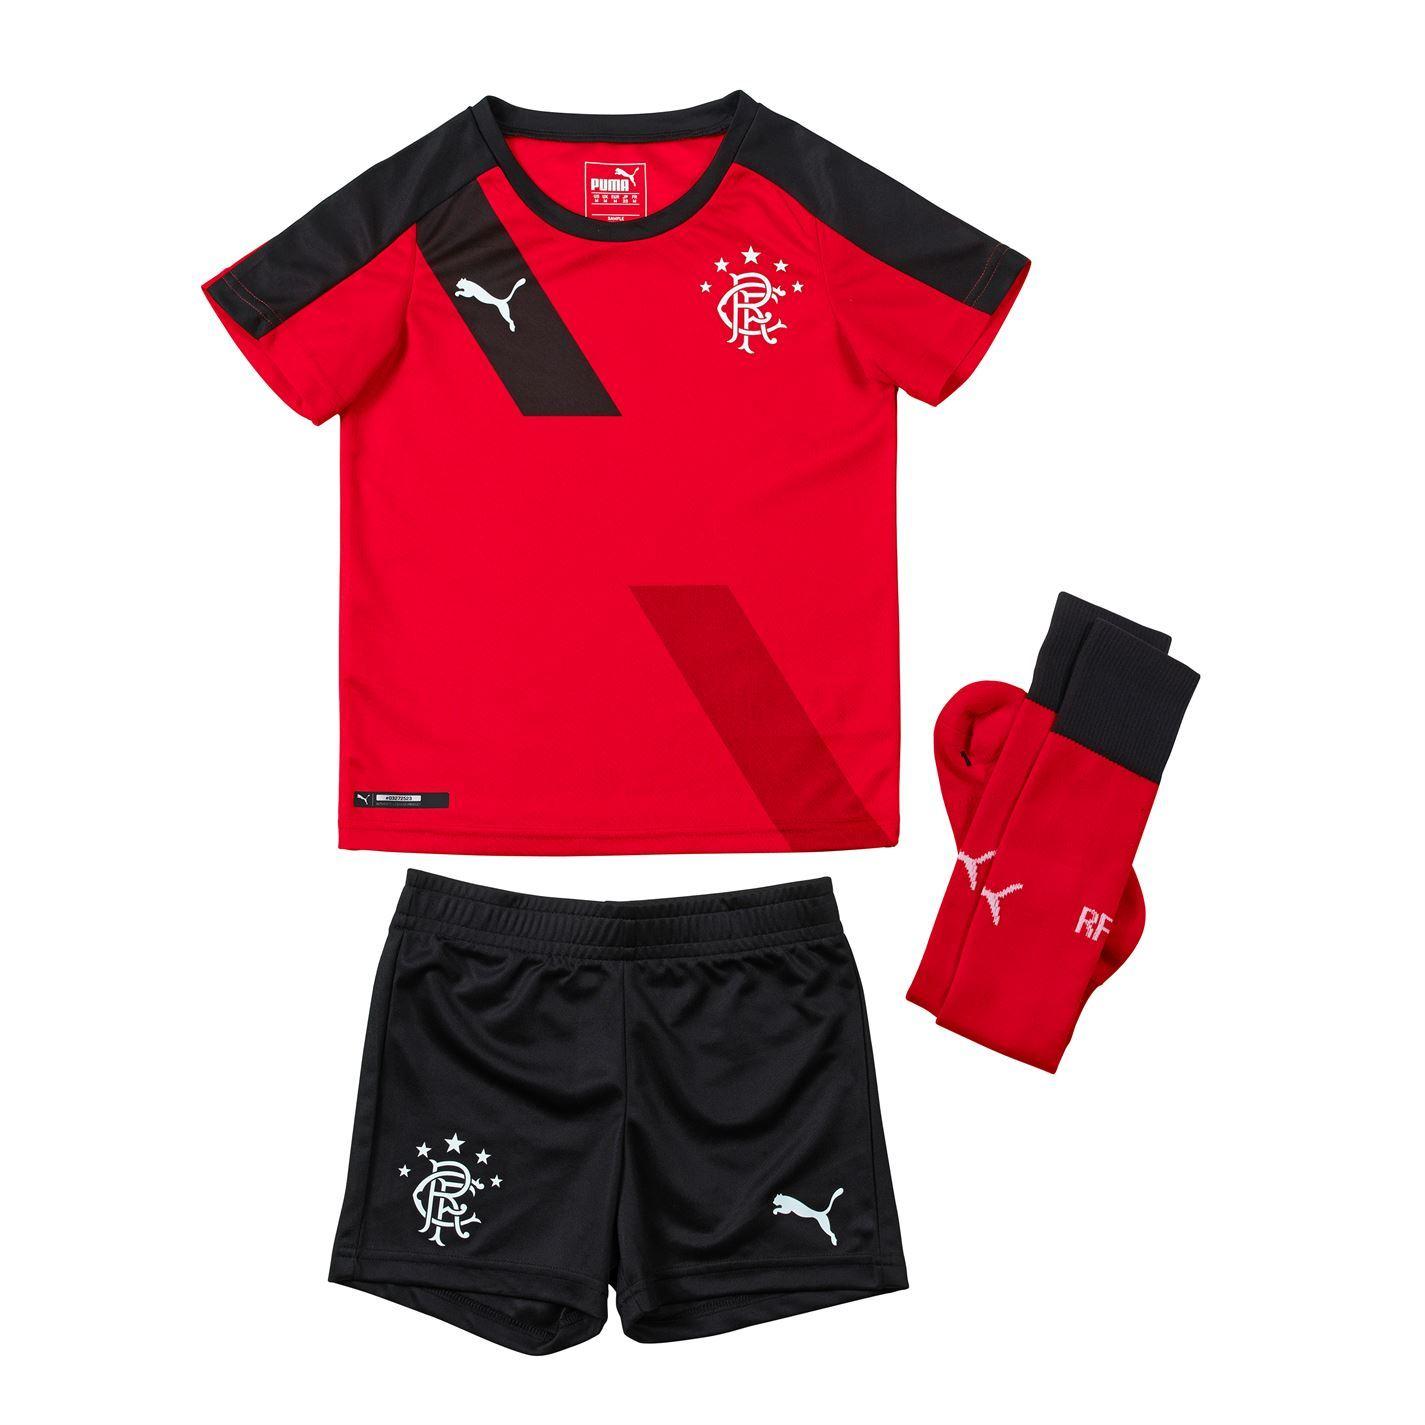 puma glasgow rangers fc away kit 2015 2016 mini childs red black football soccer ebay. Black Bedroom Furniture Sets. Home Design Ideas